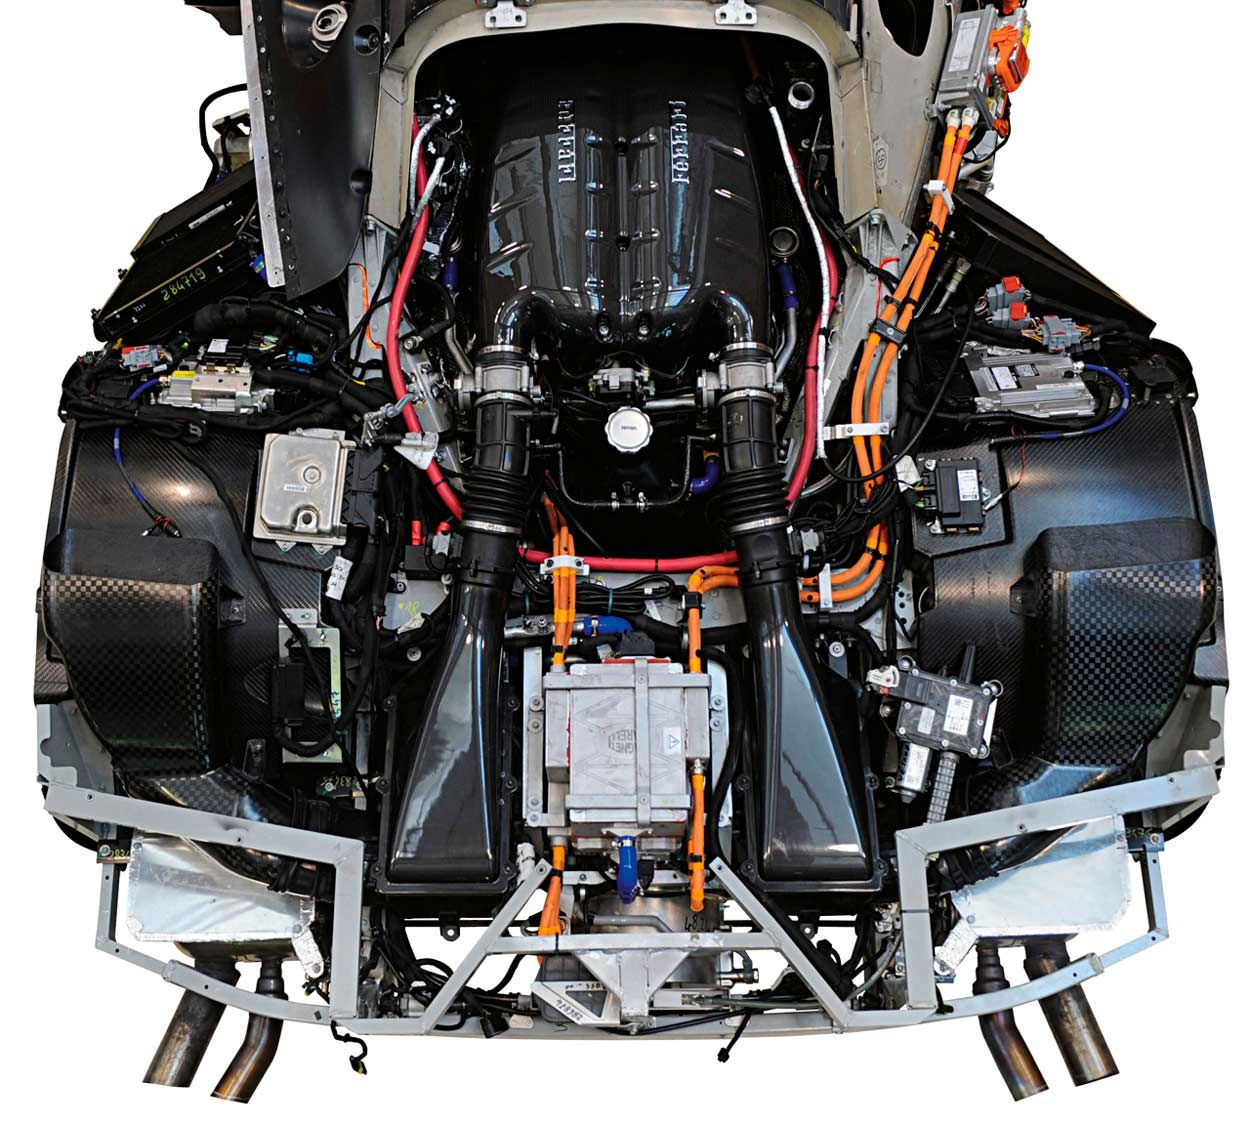 hight resolution of mclaren f1 engine details cars as art mclaren ferrari cars rh pinterest com lamborghini aventador mclaren